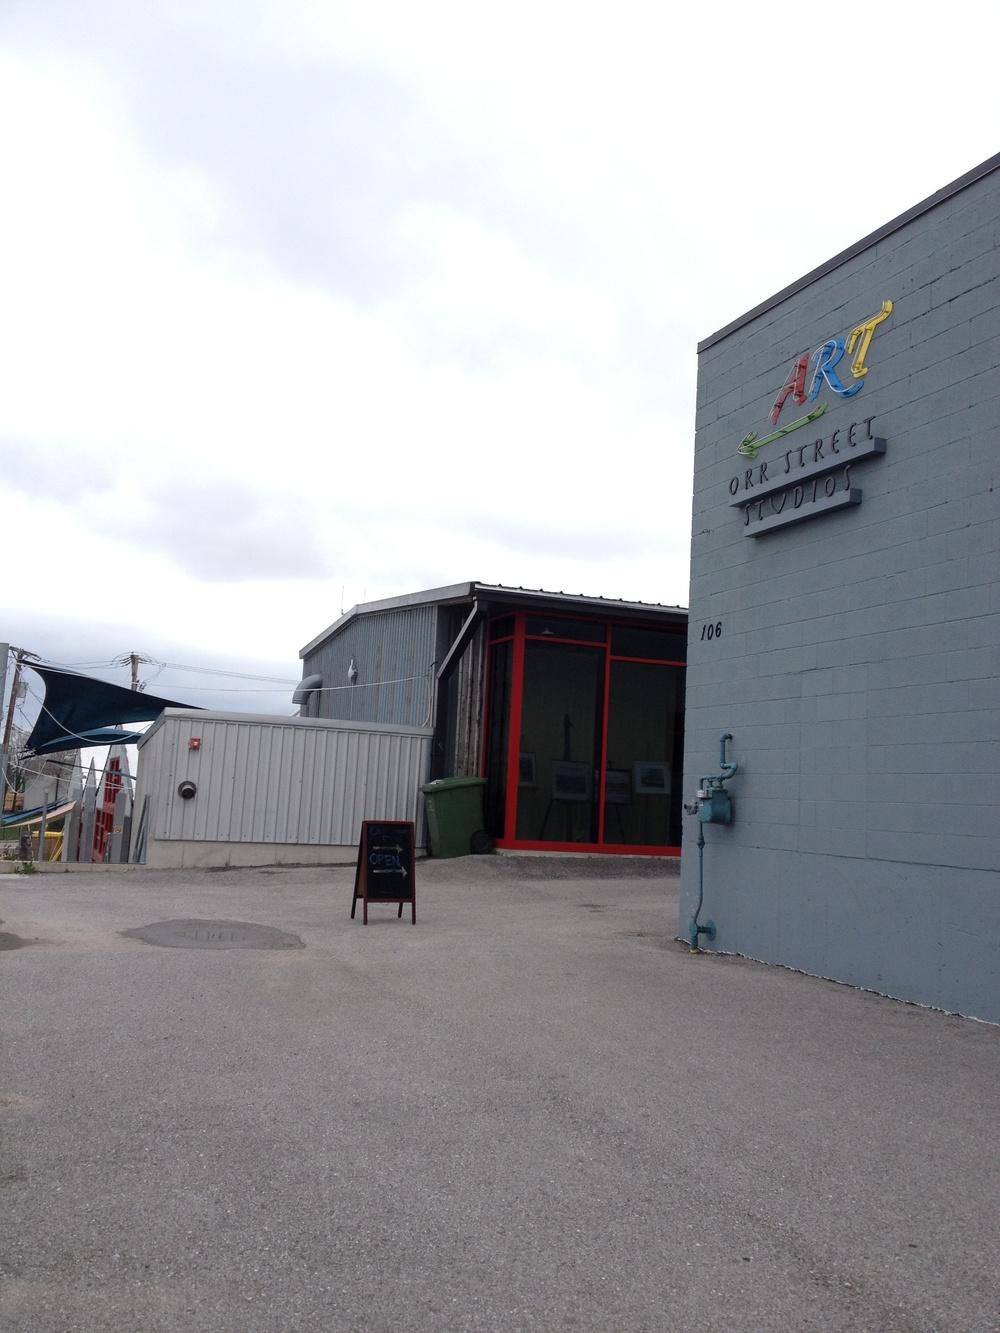 Orr Street Studios in 2013